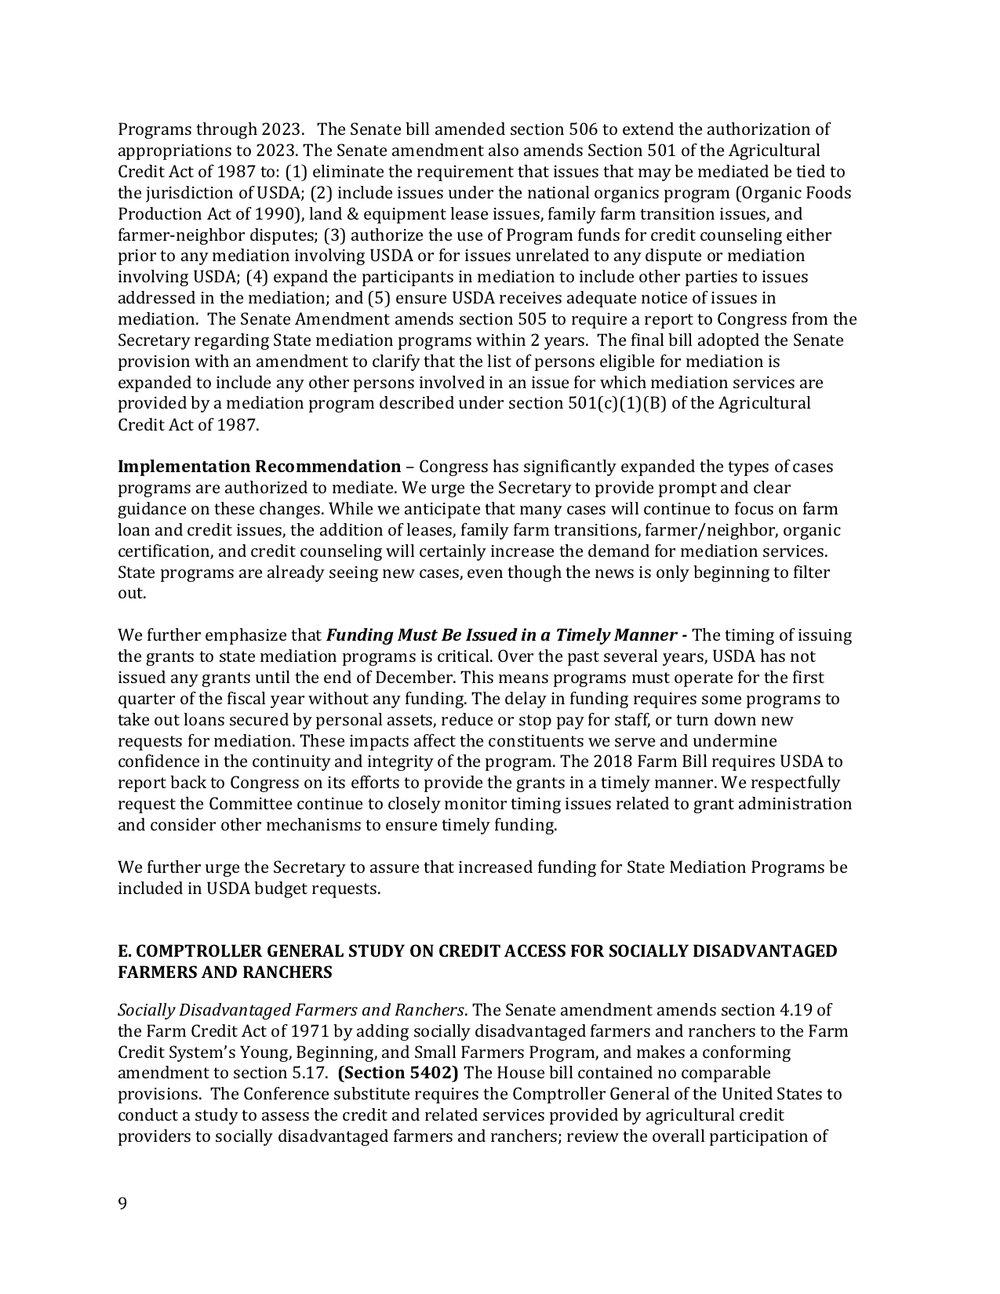 2018 Farm Bill Implementation Recommendations - Rural Co etal final March 1 page 10.jpg